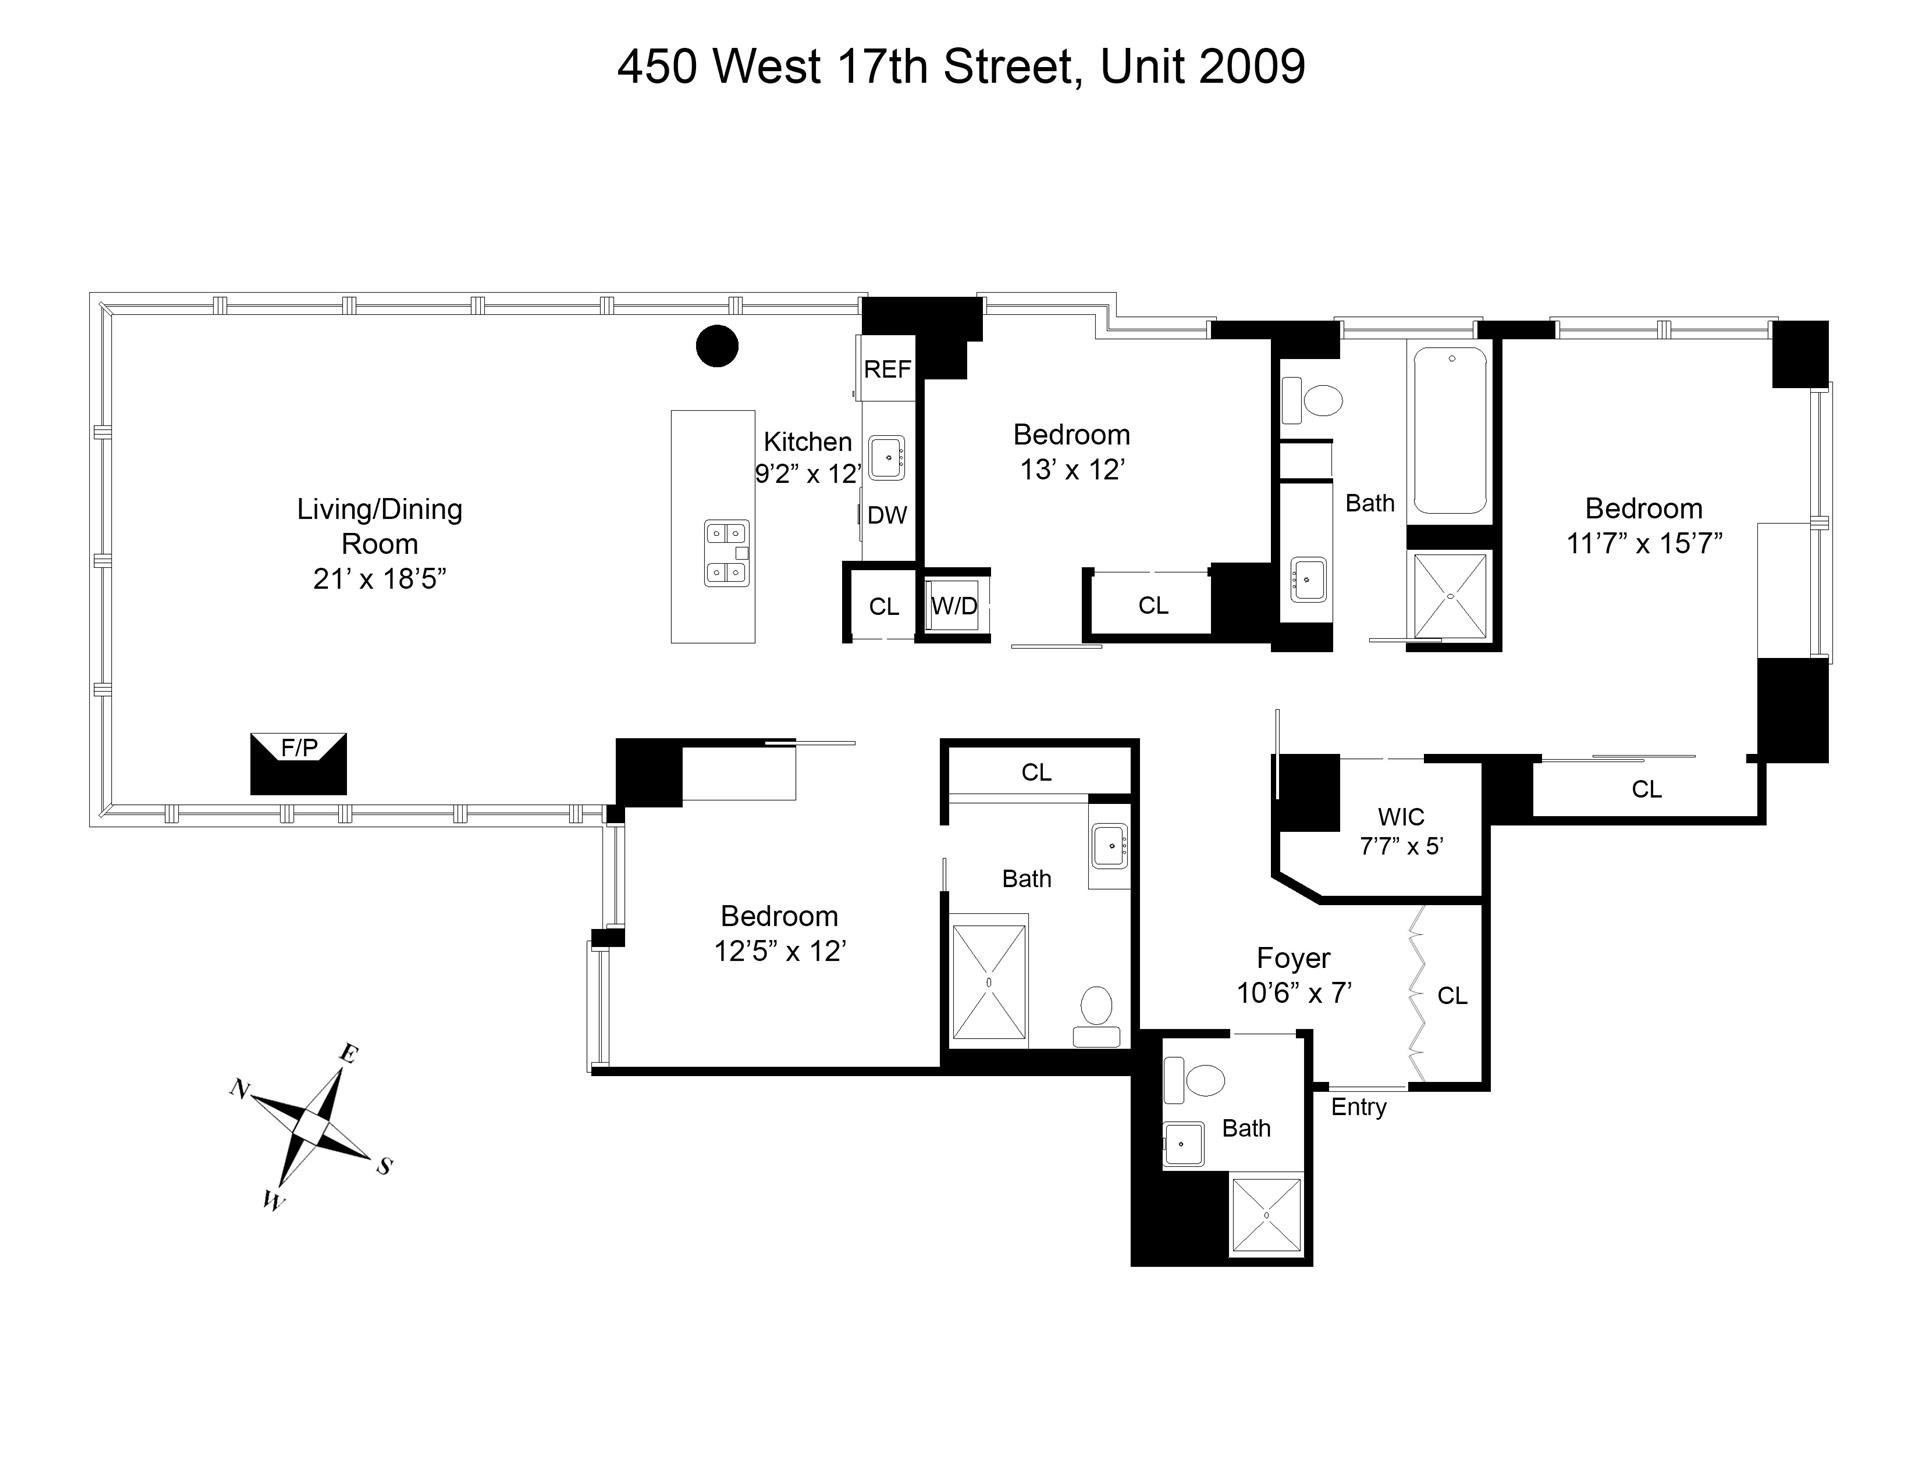 Floor plan of 450 West 17th St, 2009 - Chelsea, New York